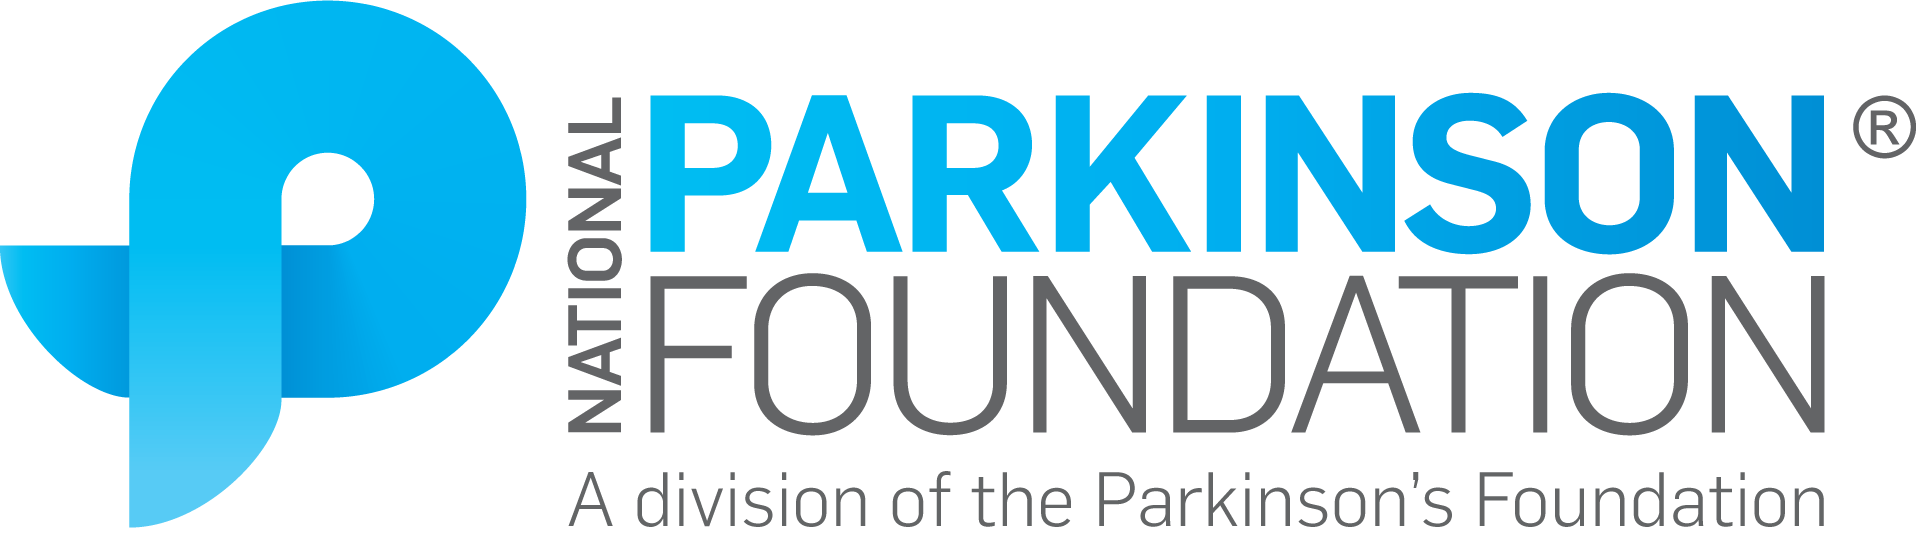 Copy of National Parkinson's Foundation